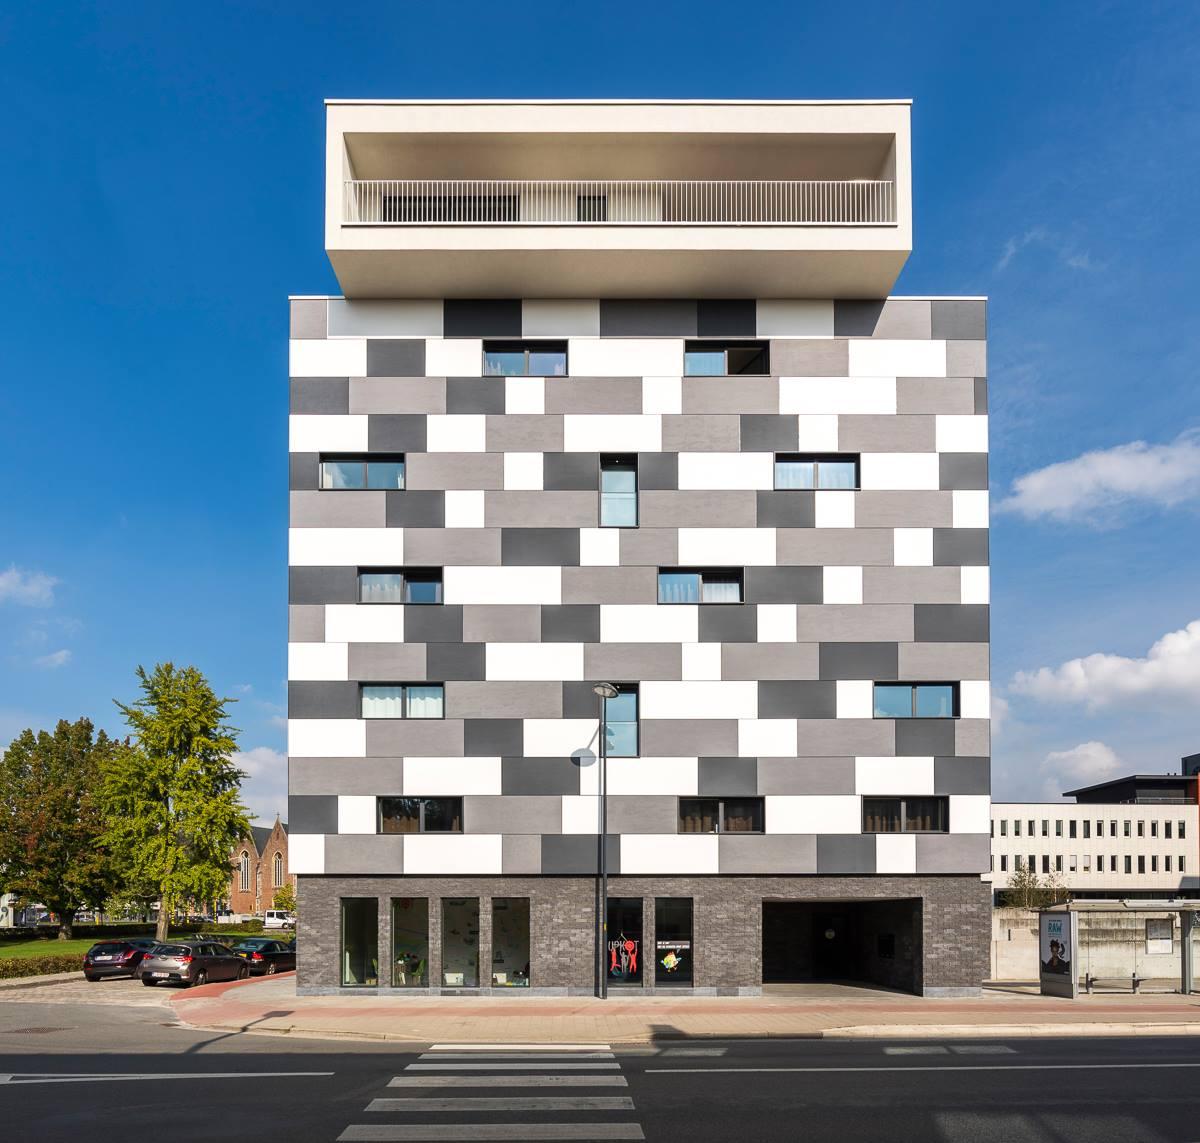 10548681 709638255780718 4580737942693656967 o 709638255780718 | Baeyens & Beck architecten Gent | architect nieuwbouw renovatie interieur | high end | architectenbureau